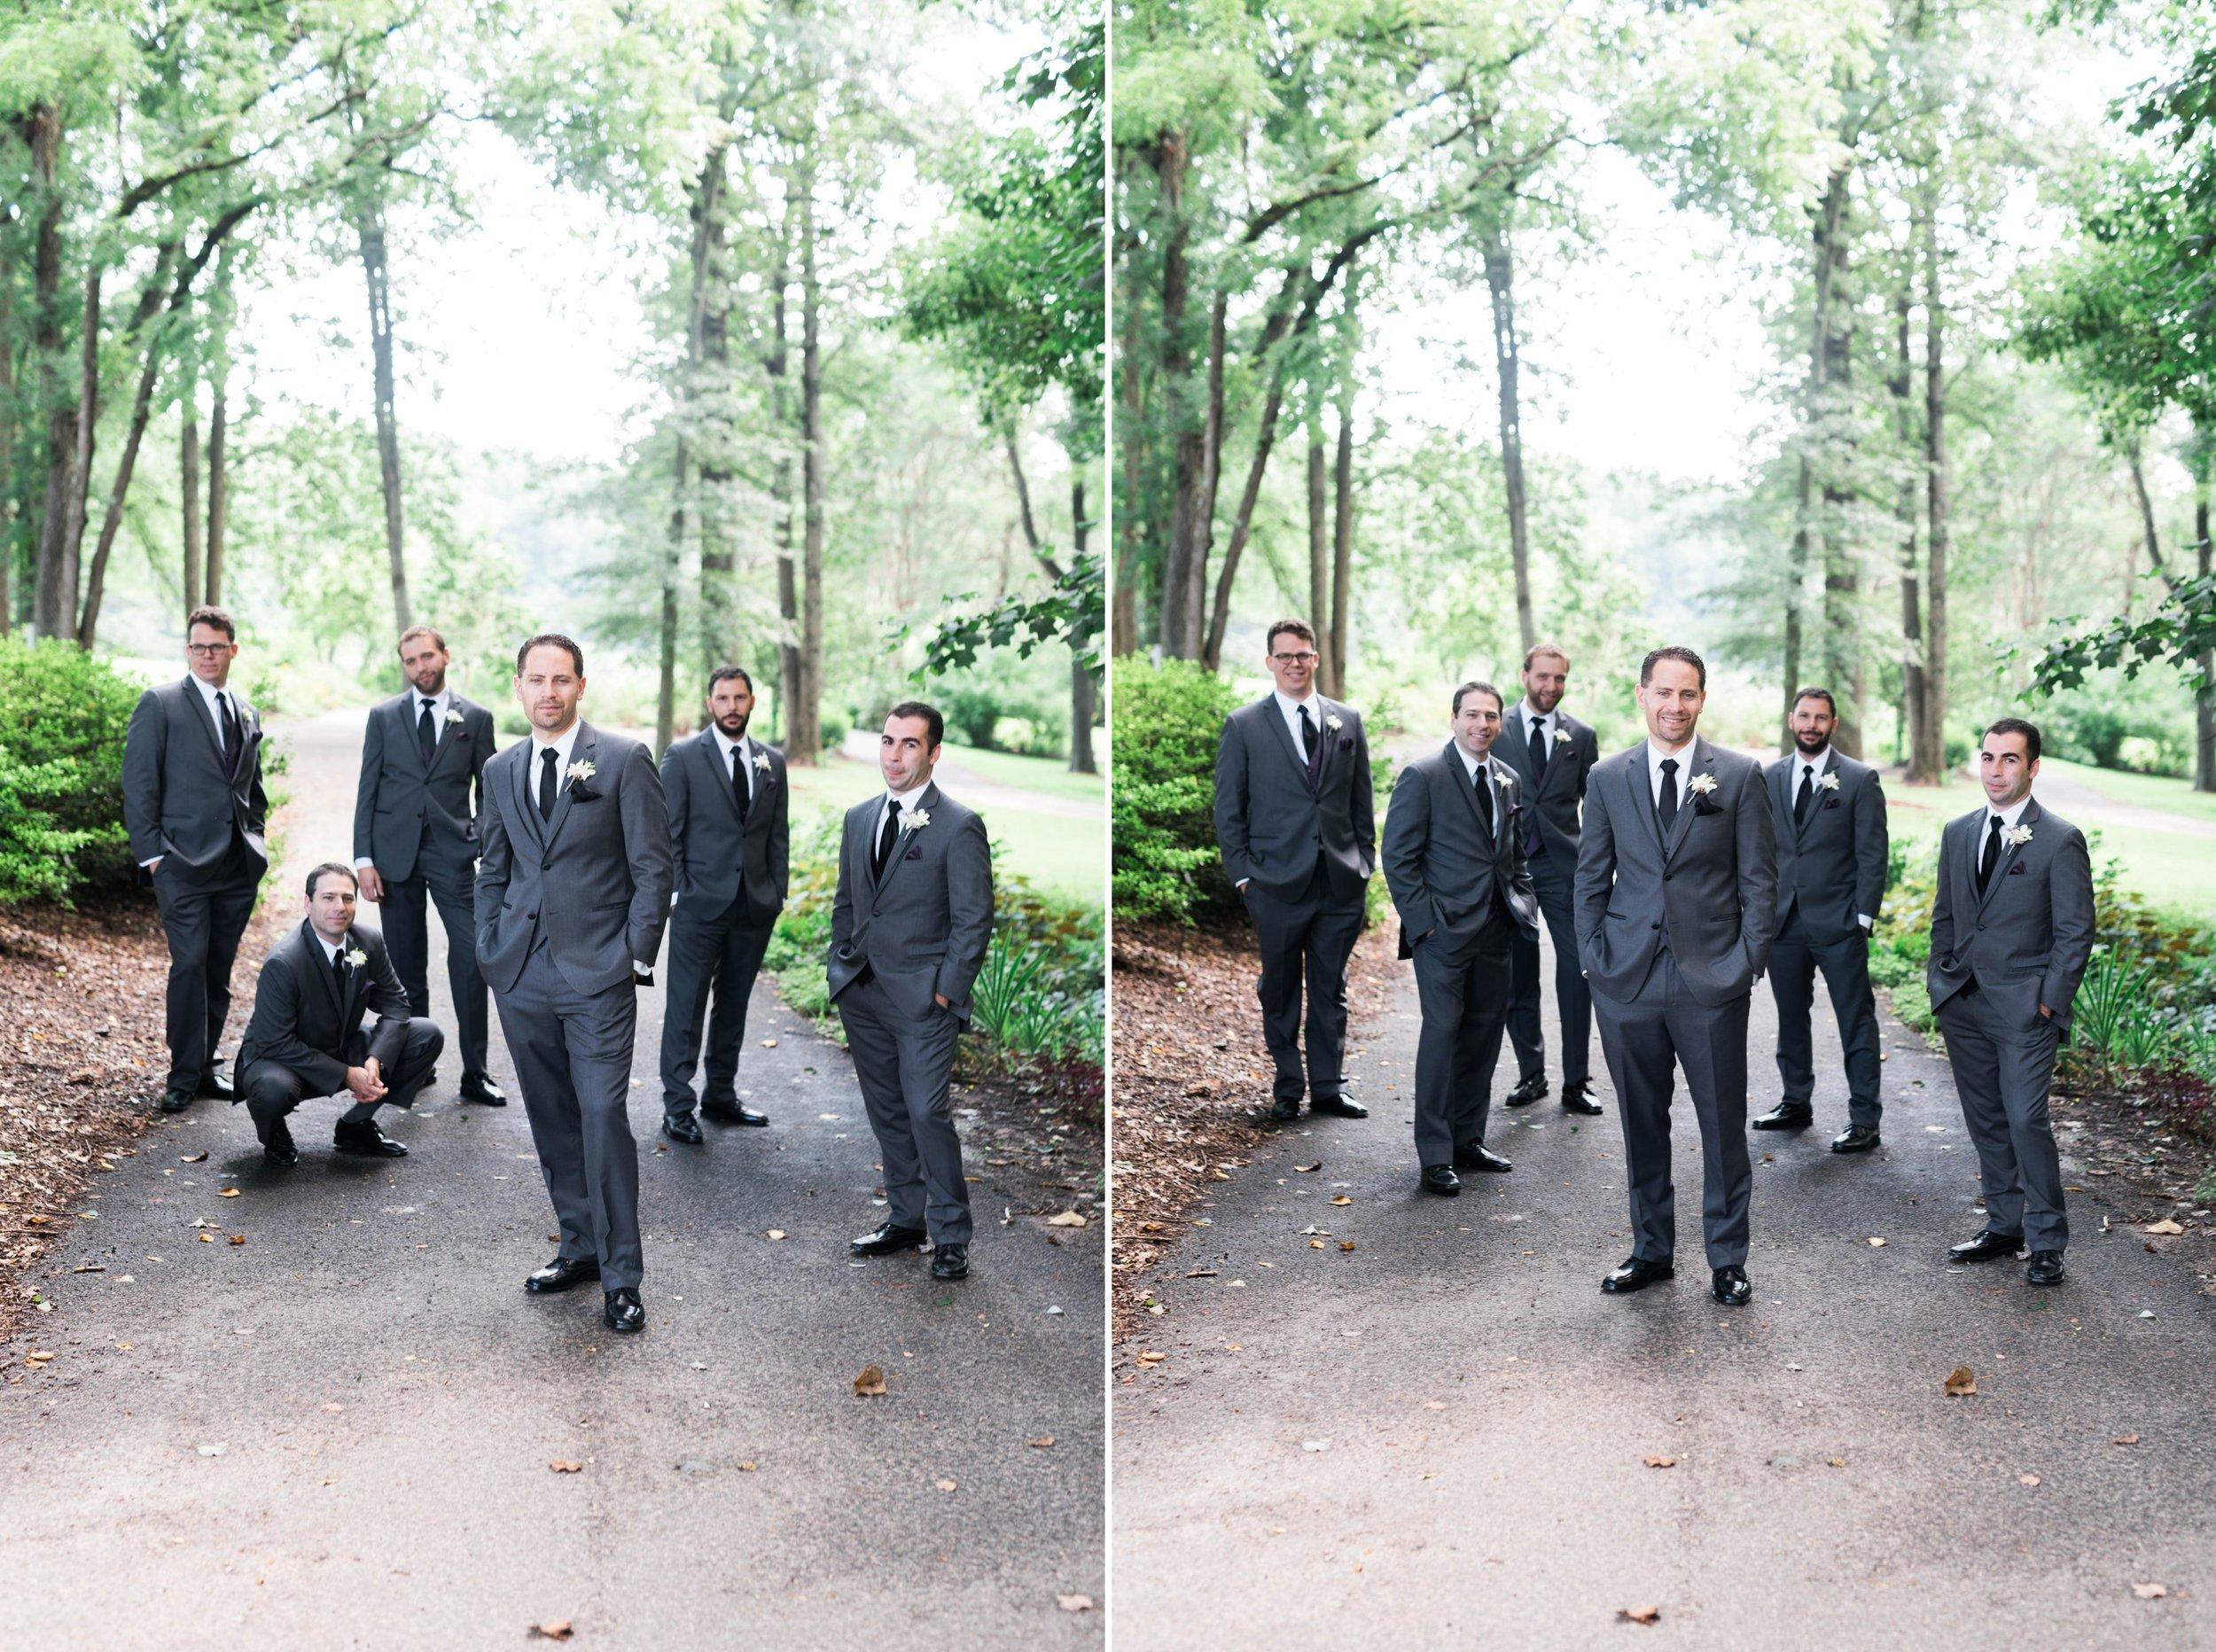 TheAtriumatMeadowlark_Virginiawedding photographer_lynchburgweddingphotographer_DCweddingPhotographer_KristinAaron 30.jpg